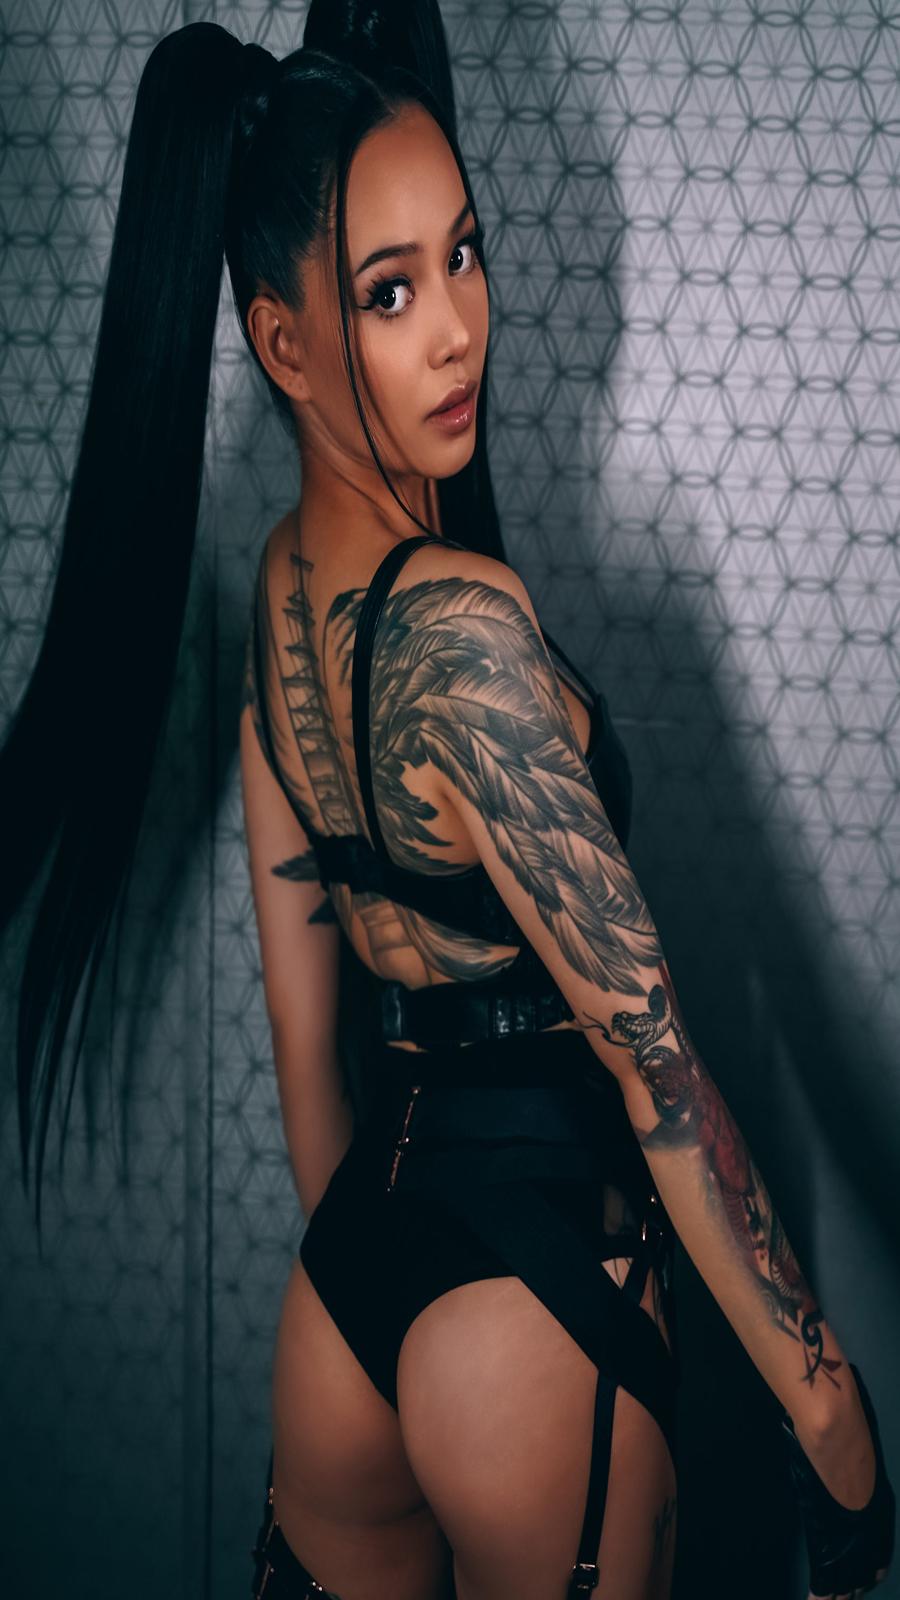 Beautiful Body Bella Poarch Wallpapers Download